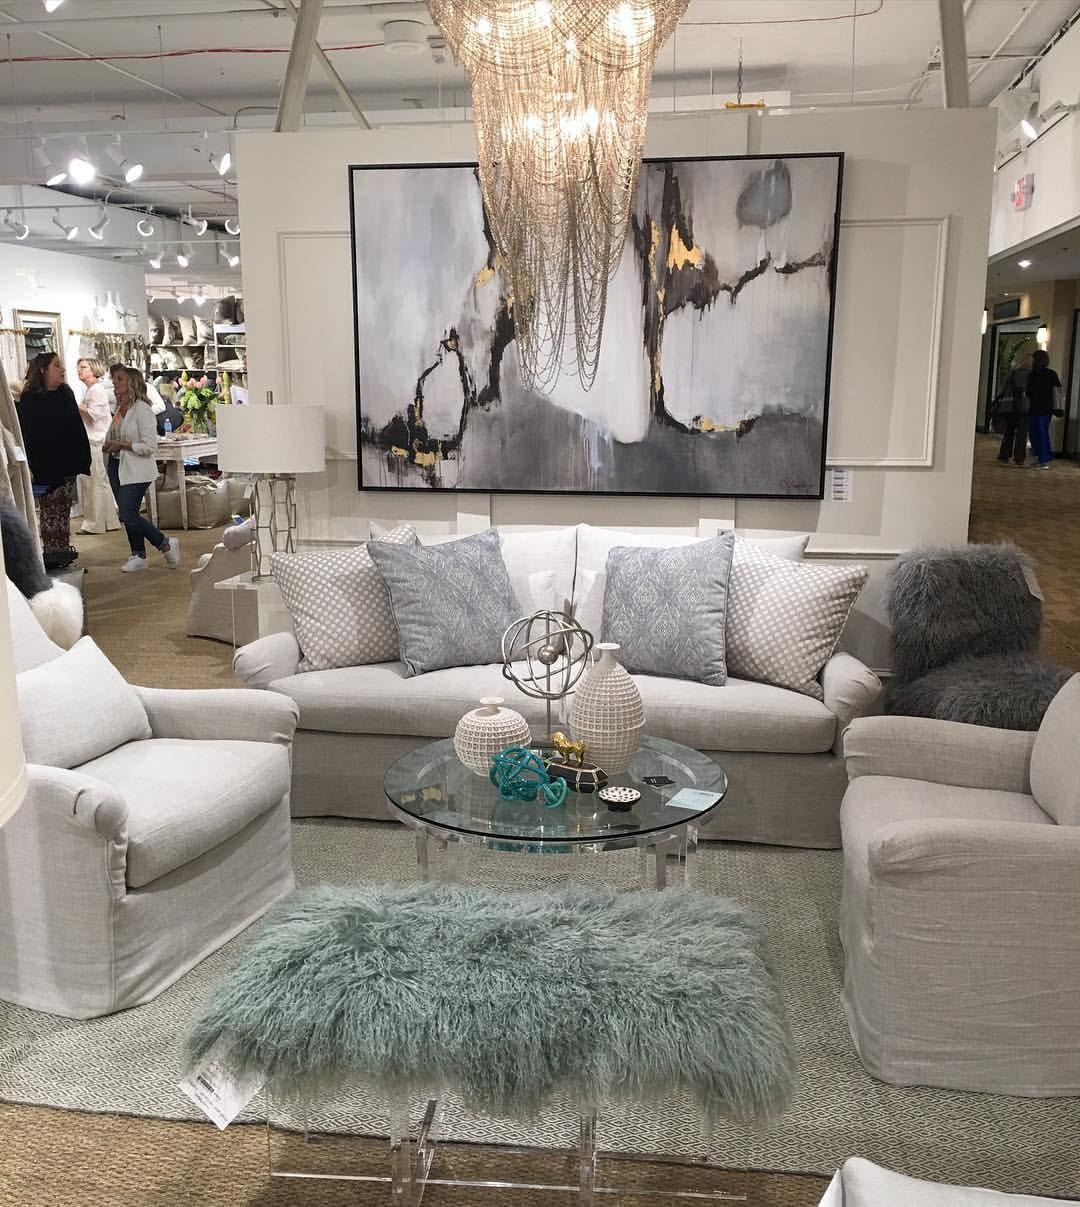 Instagram Photo By Inspire Me Home Decor Apr 18 2016 At 12 26am Utc Home Decor Furniture Decor Showroom living room ideas